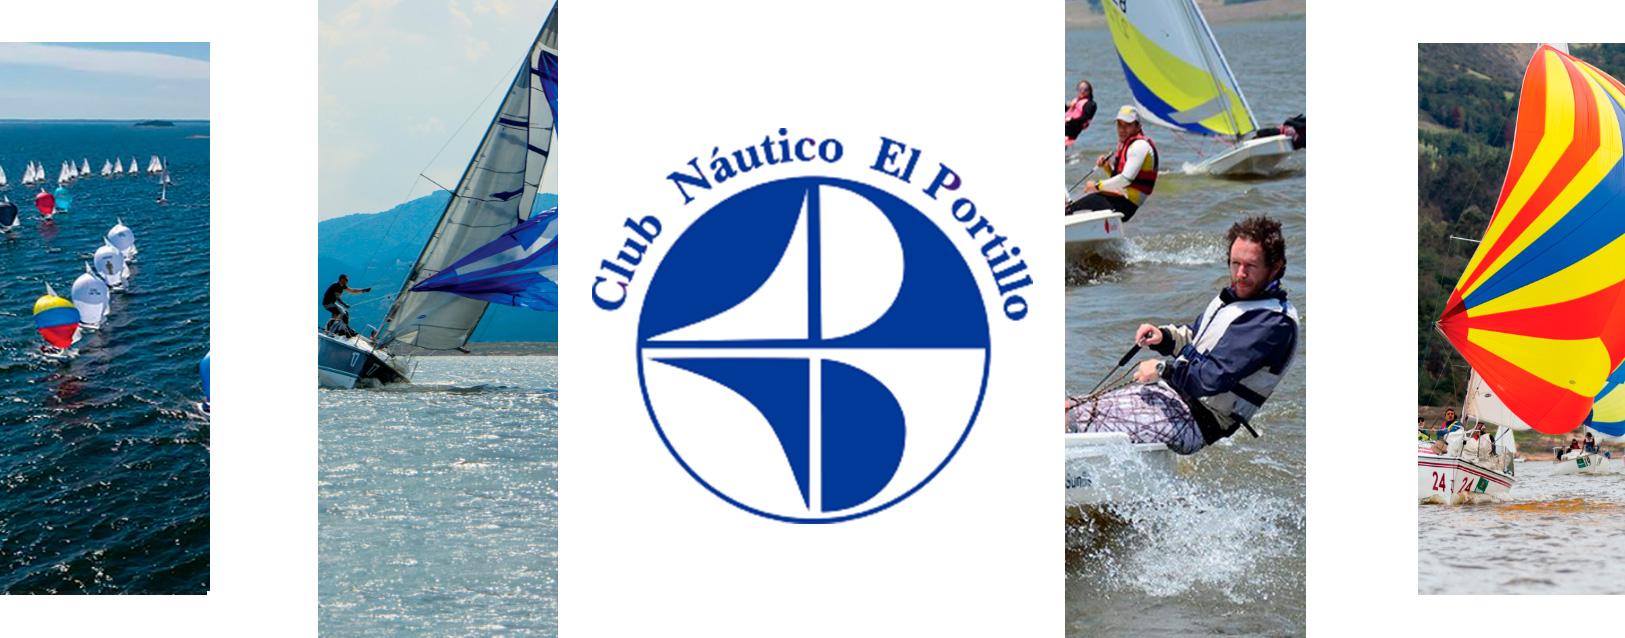 Banner logo Club nautico con fotos